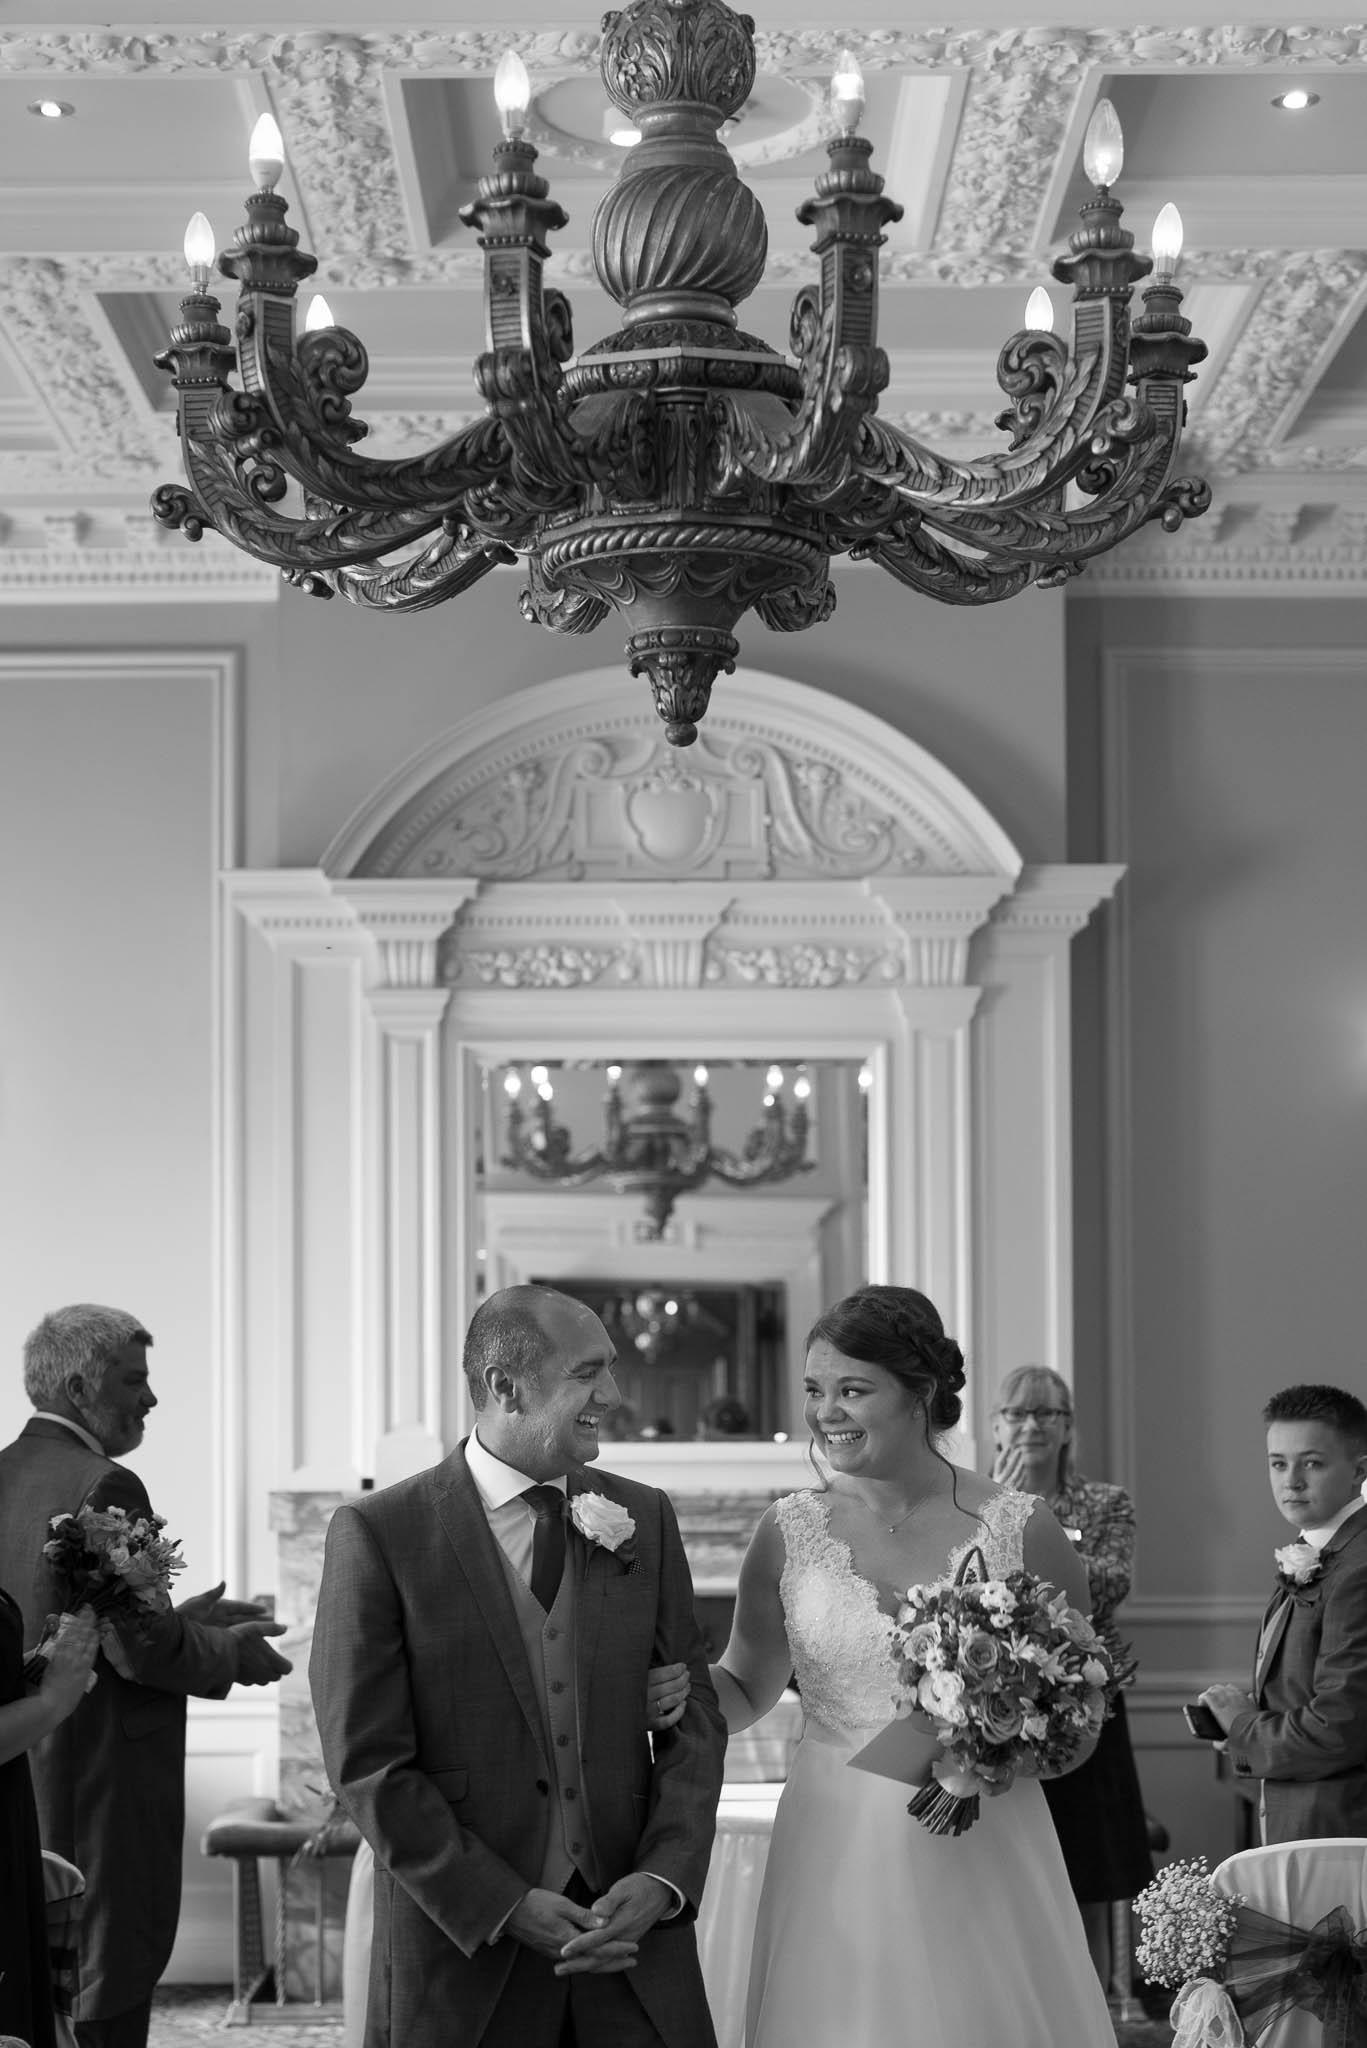 Crathorne Hall Hotel Wedding Photographer60.jpg